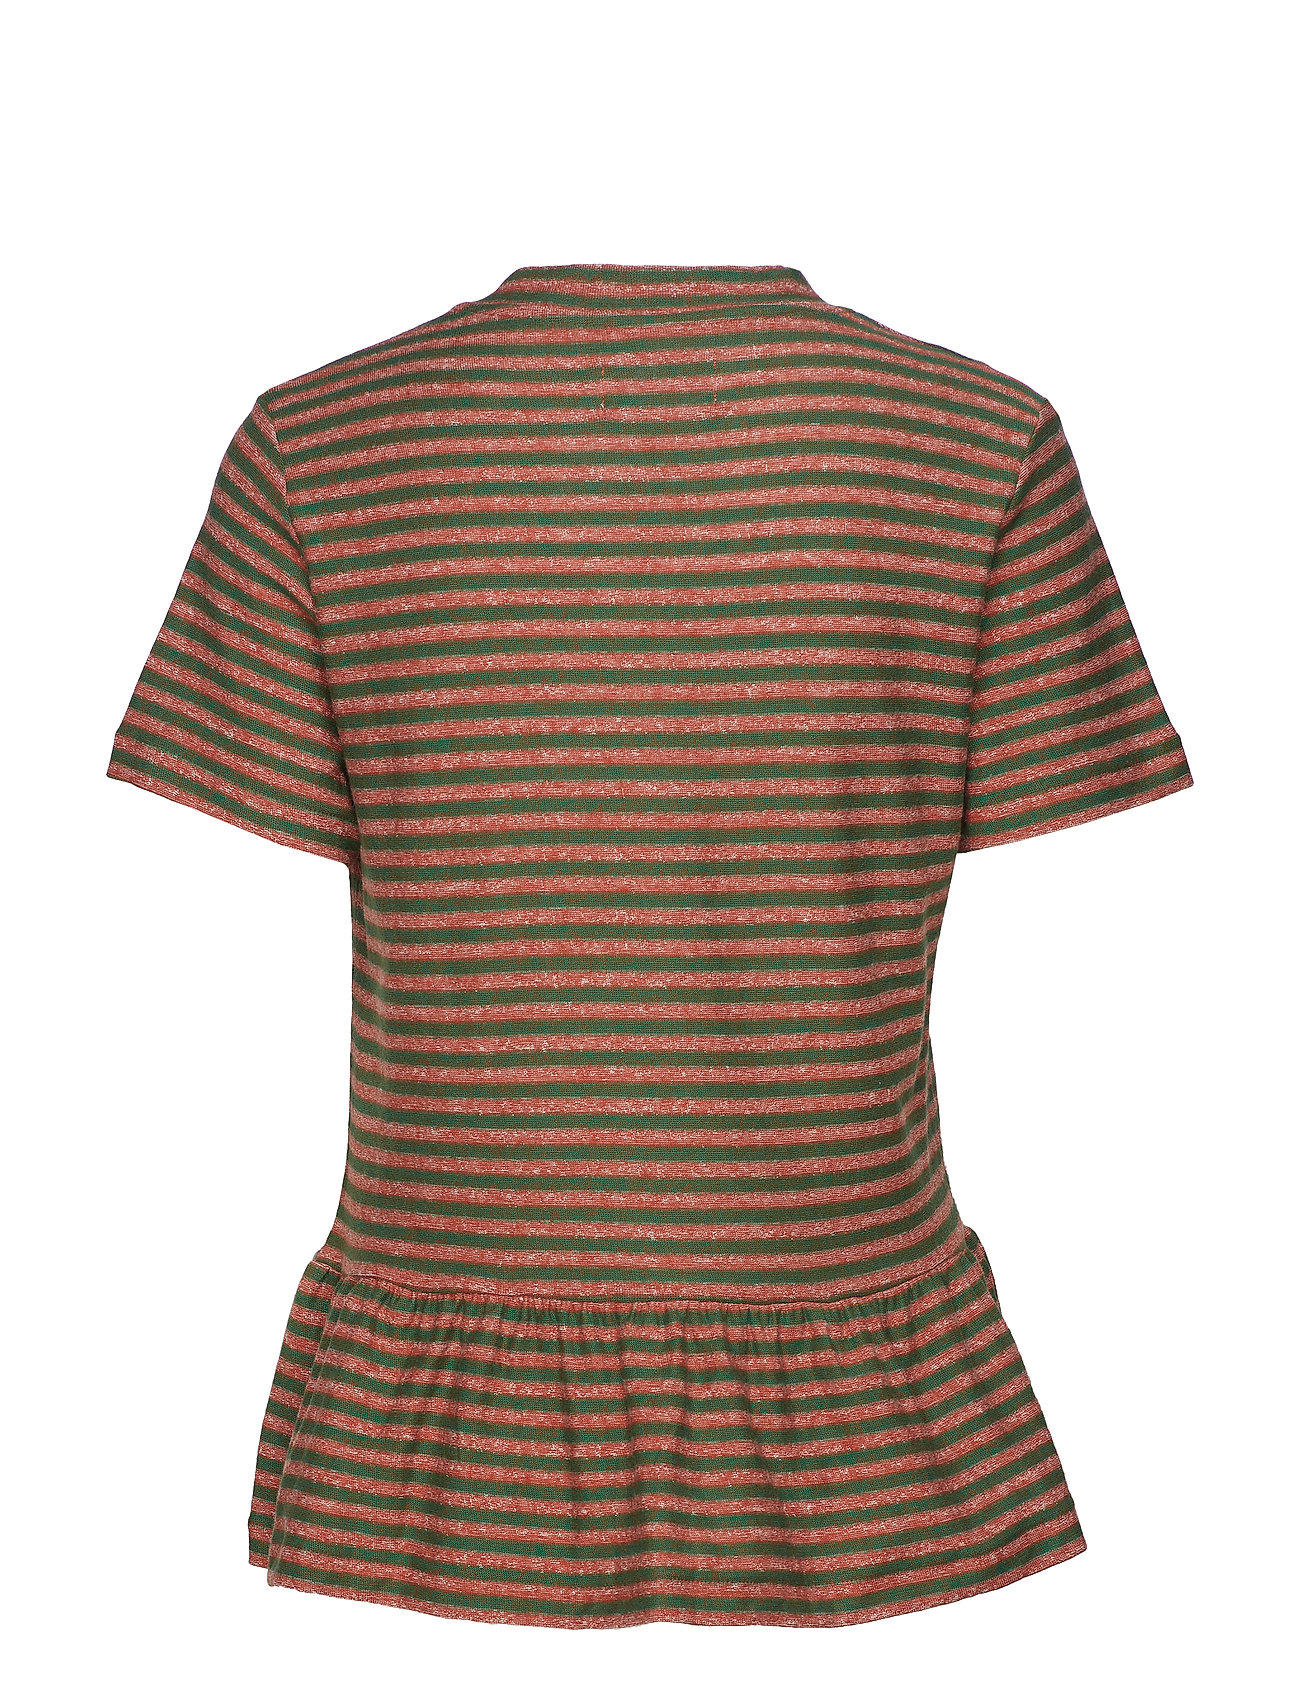 Libertine-Libertine Wake- T-shirts & hauts jr7ldjfY 6OSwk 7cxMWmc9